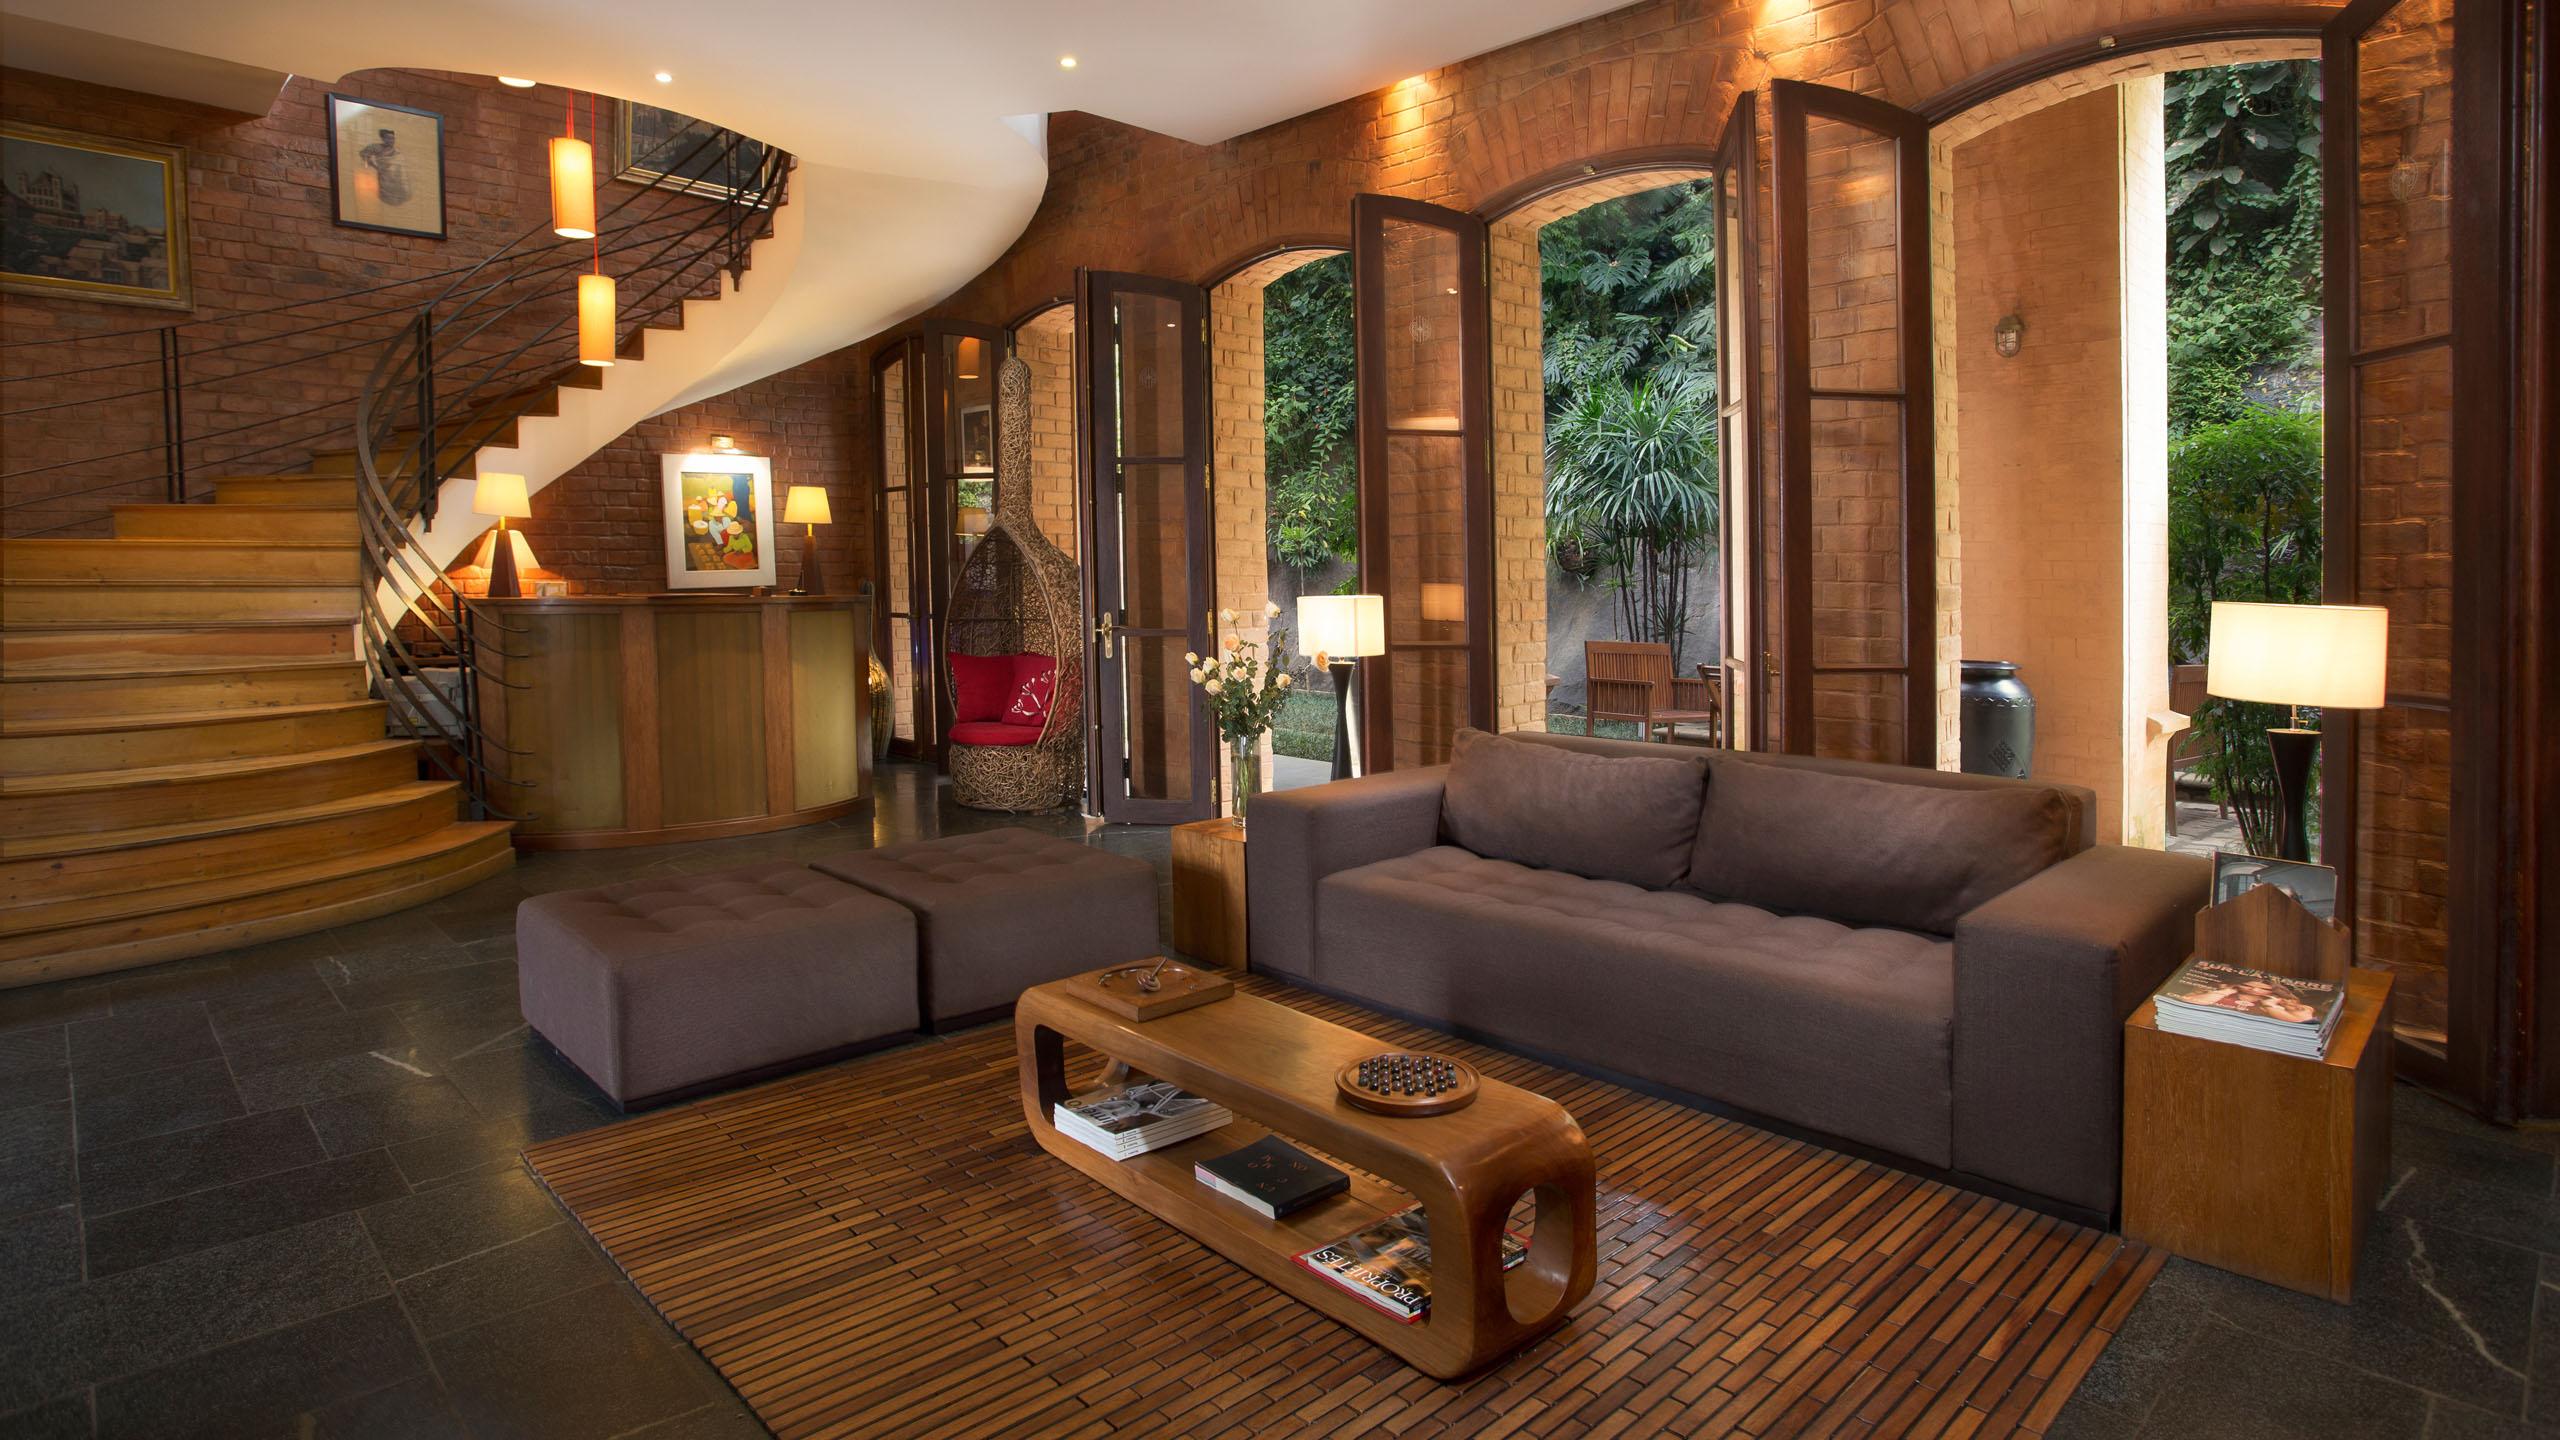 Maison-Gallieni-Antananarivo-lounge